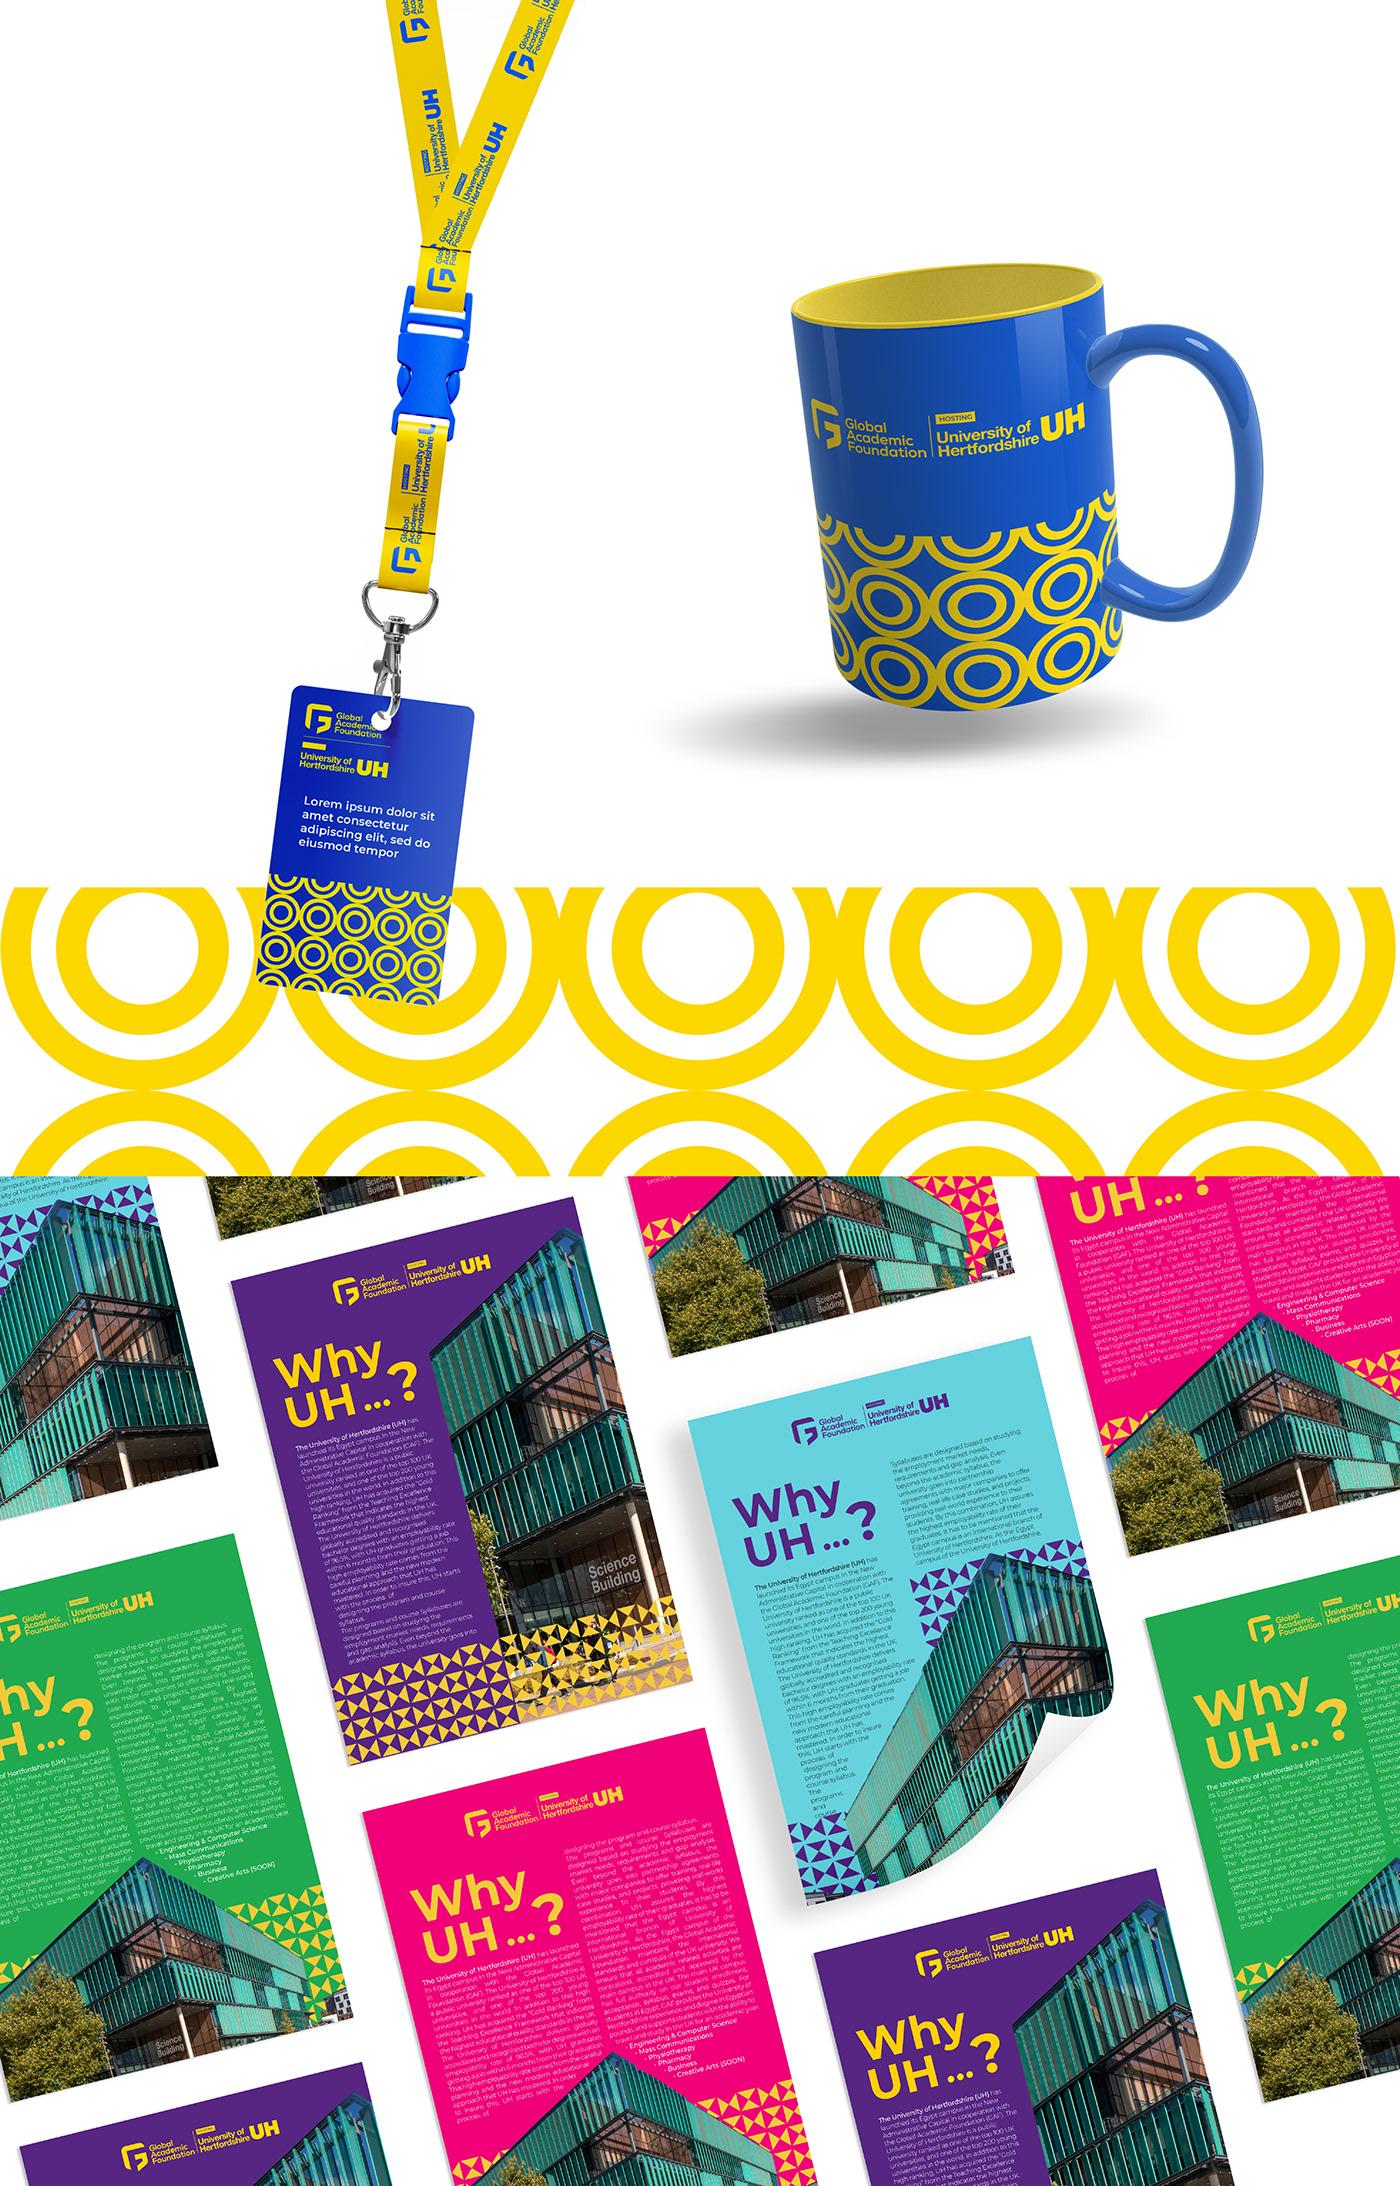 branding  colorful egypt London popping brand rebranding school United Kingdom University